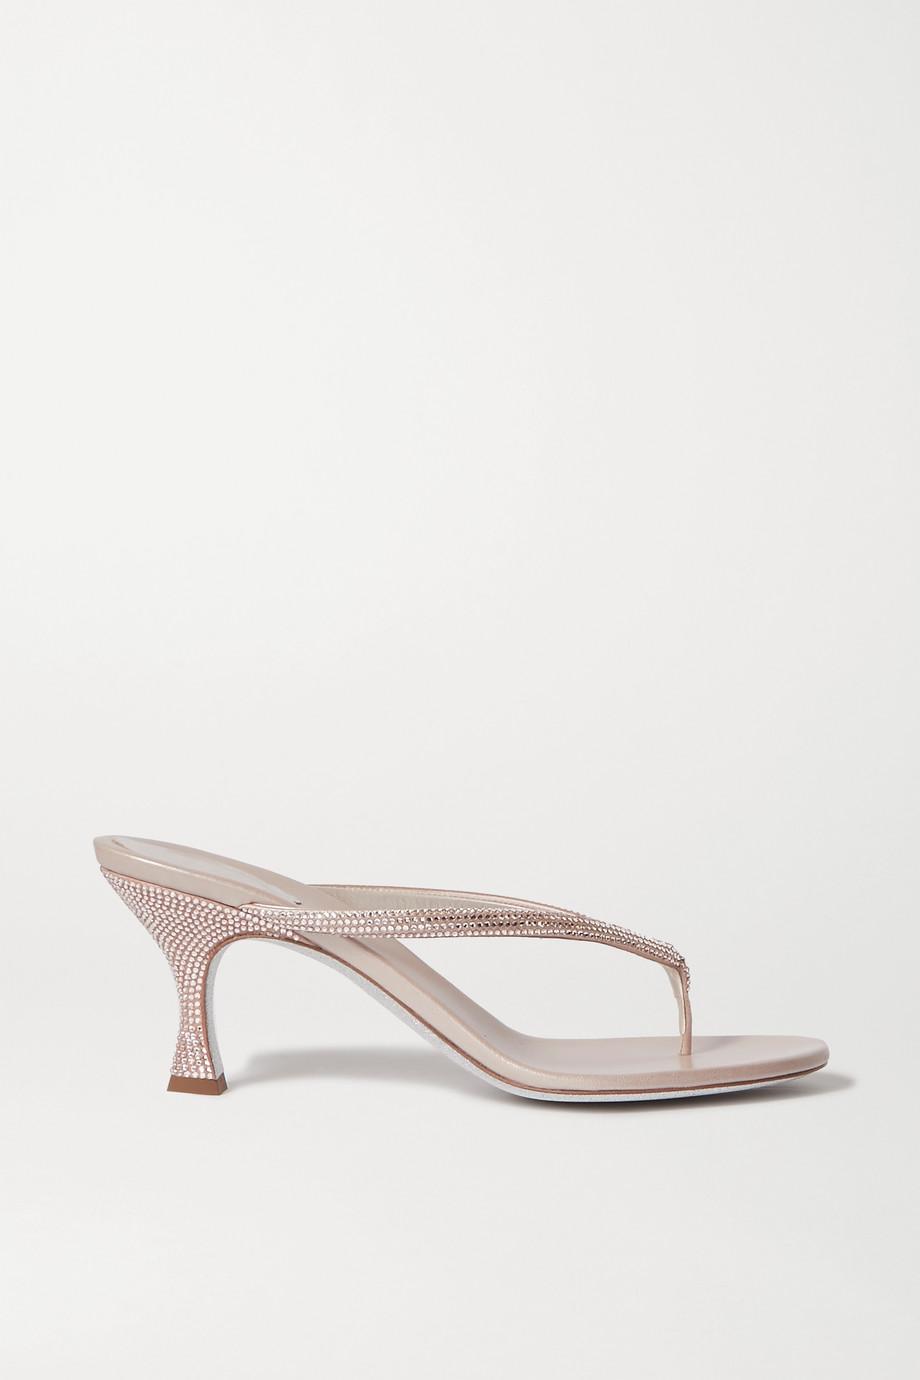 René Caovilla 水晶缀饰缎布皮革凉鞋